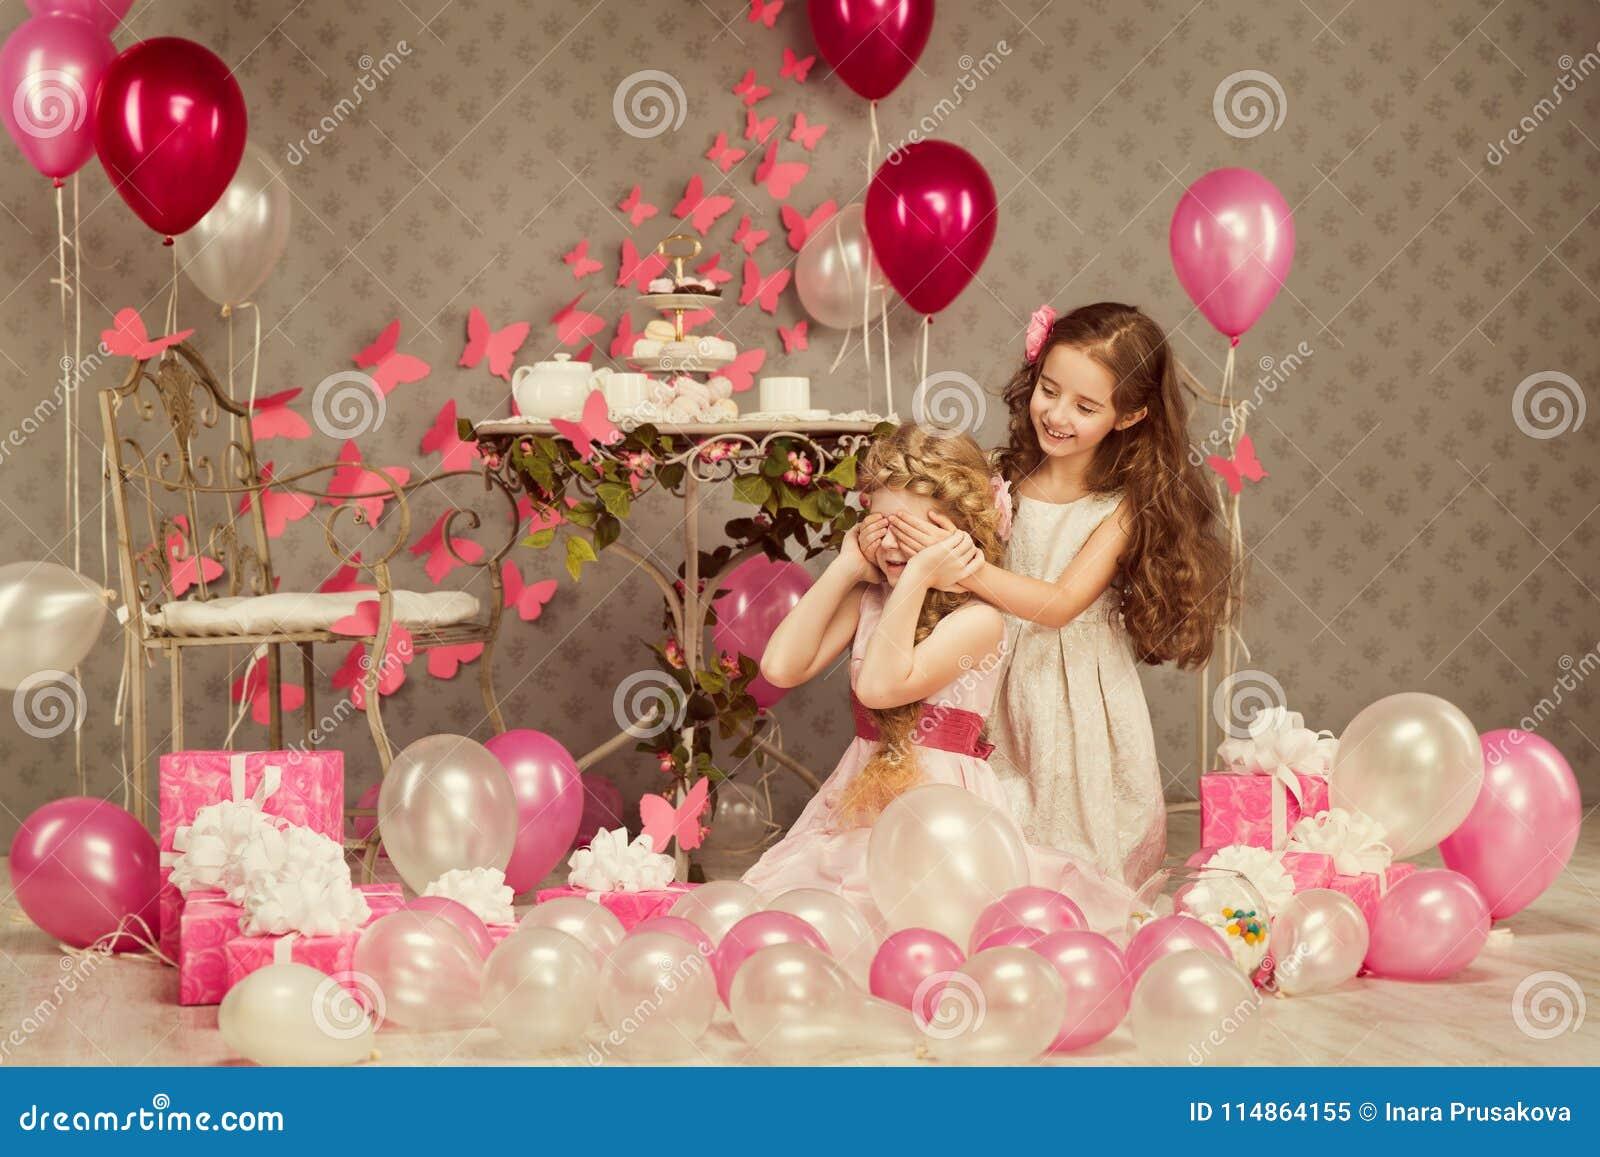 Children Birthday Party, Kid Girl Covering Eyes, Presents Balloons